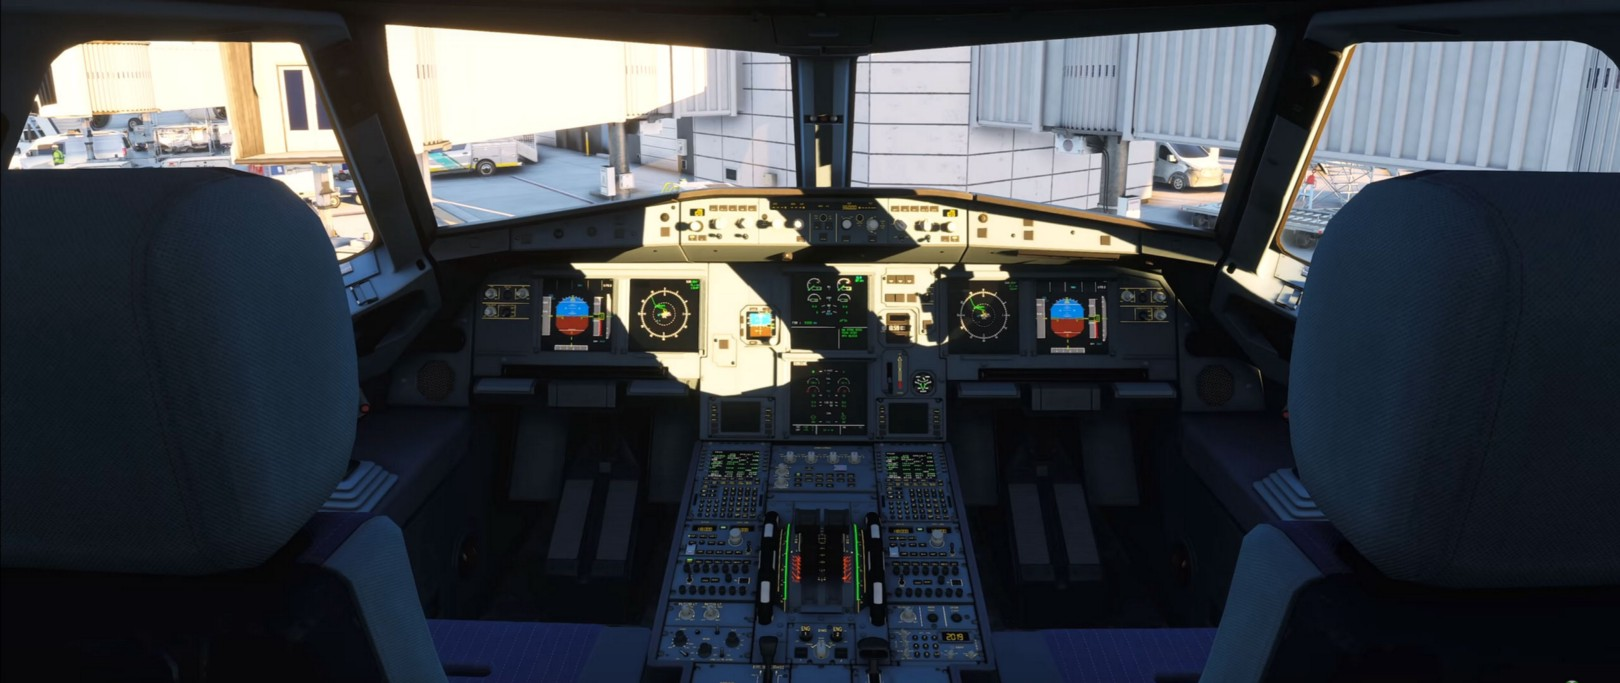 Microsoft Flight Simulator 2020 system requirements